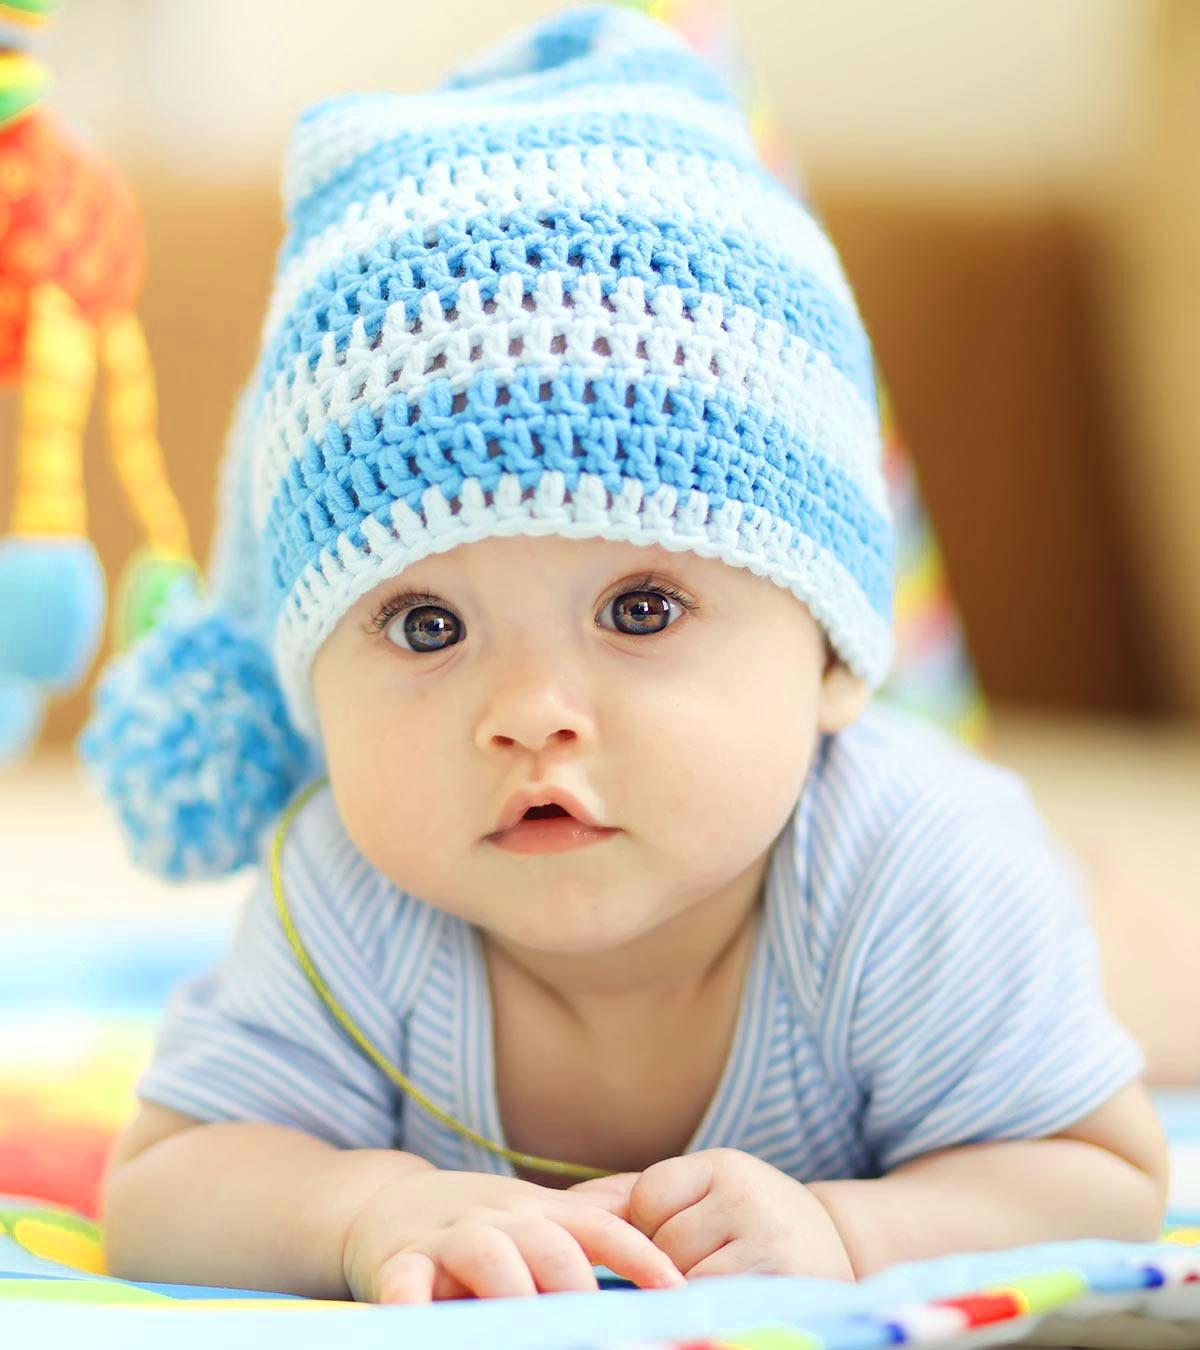 Free Cute Baby Boys Whatsapp DP Wallpaper Free